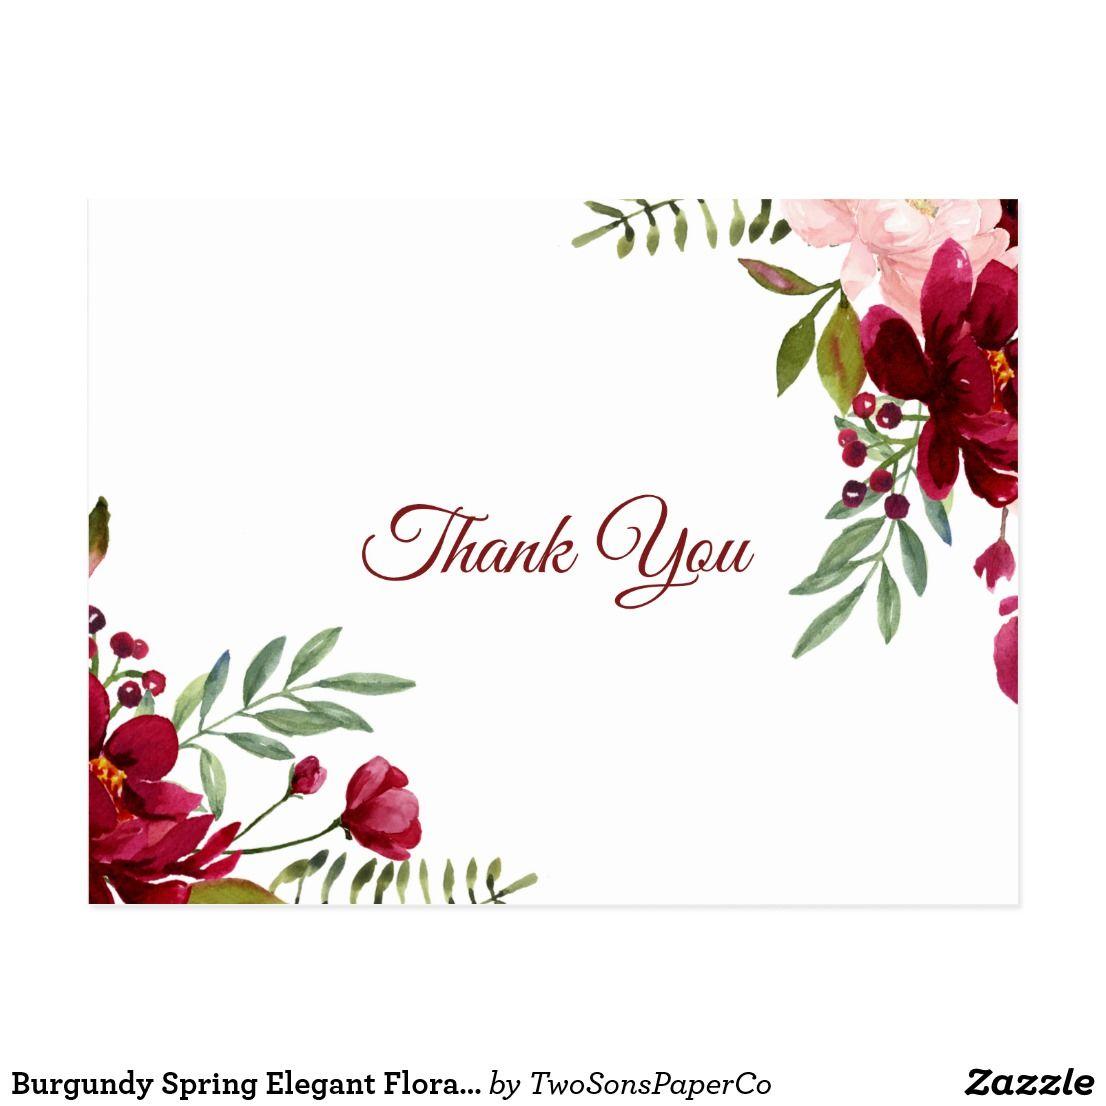 Burgundy spring elegant floral thank you postcard with